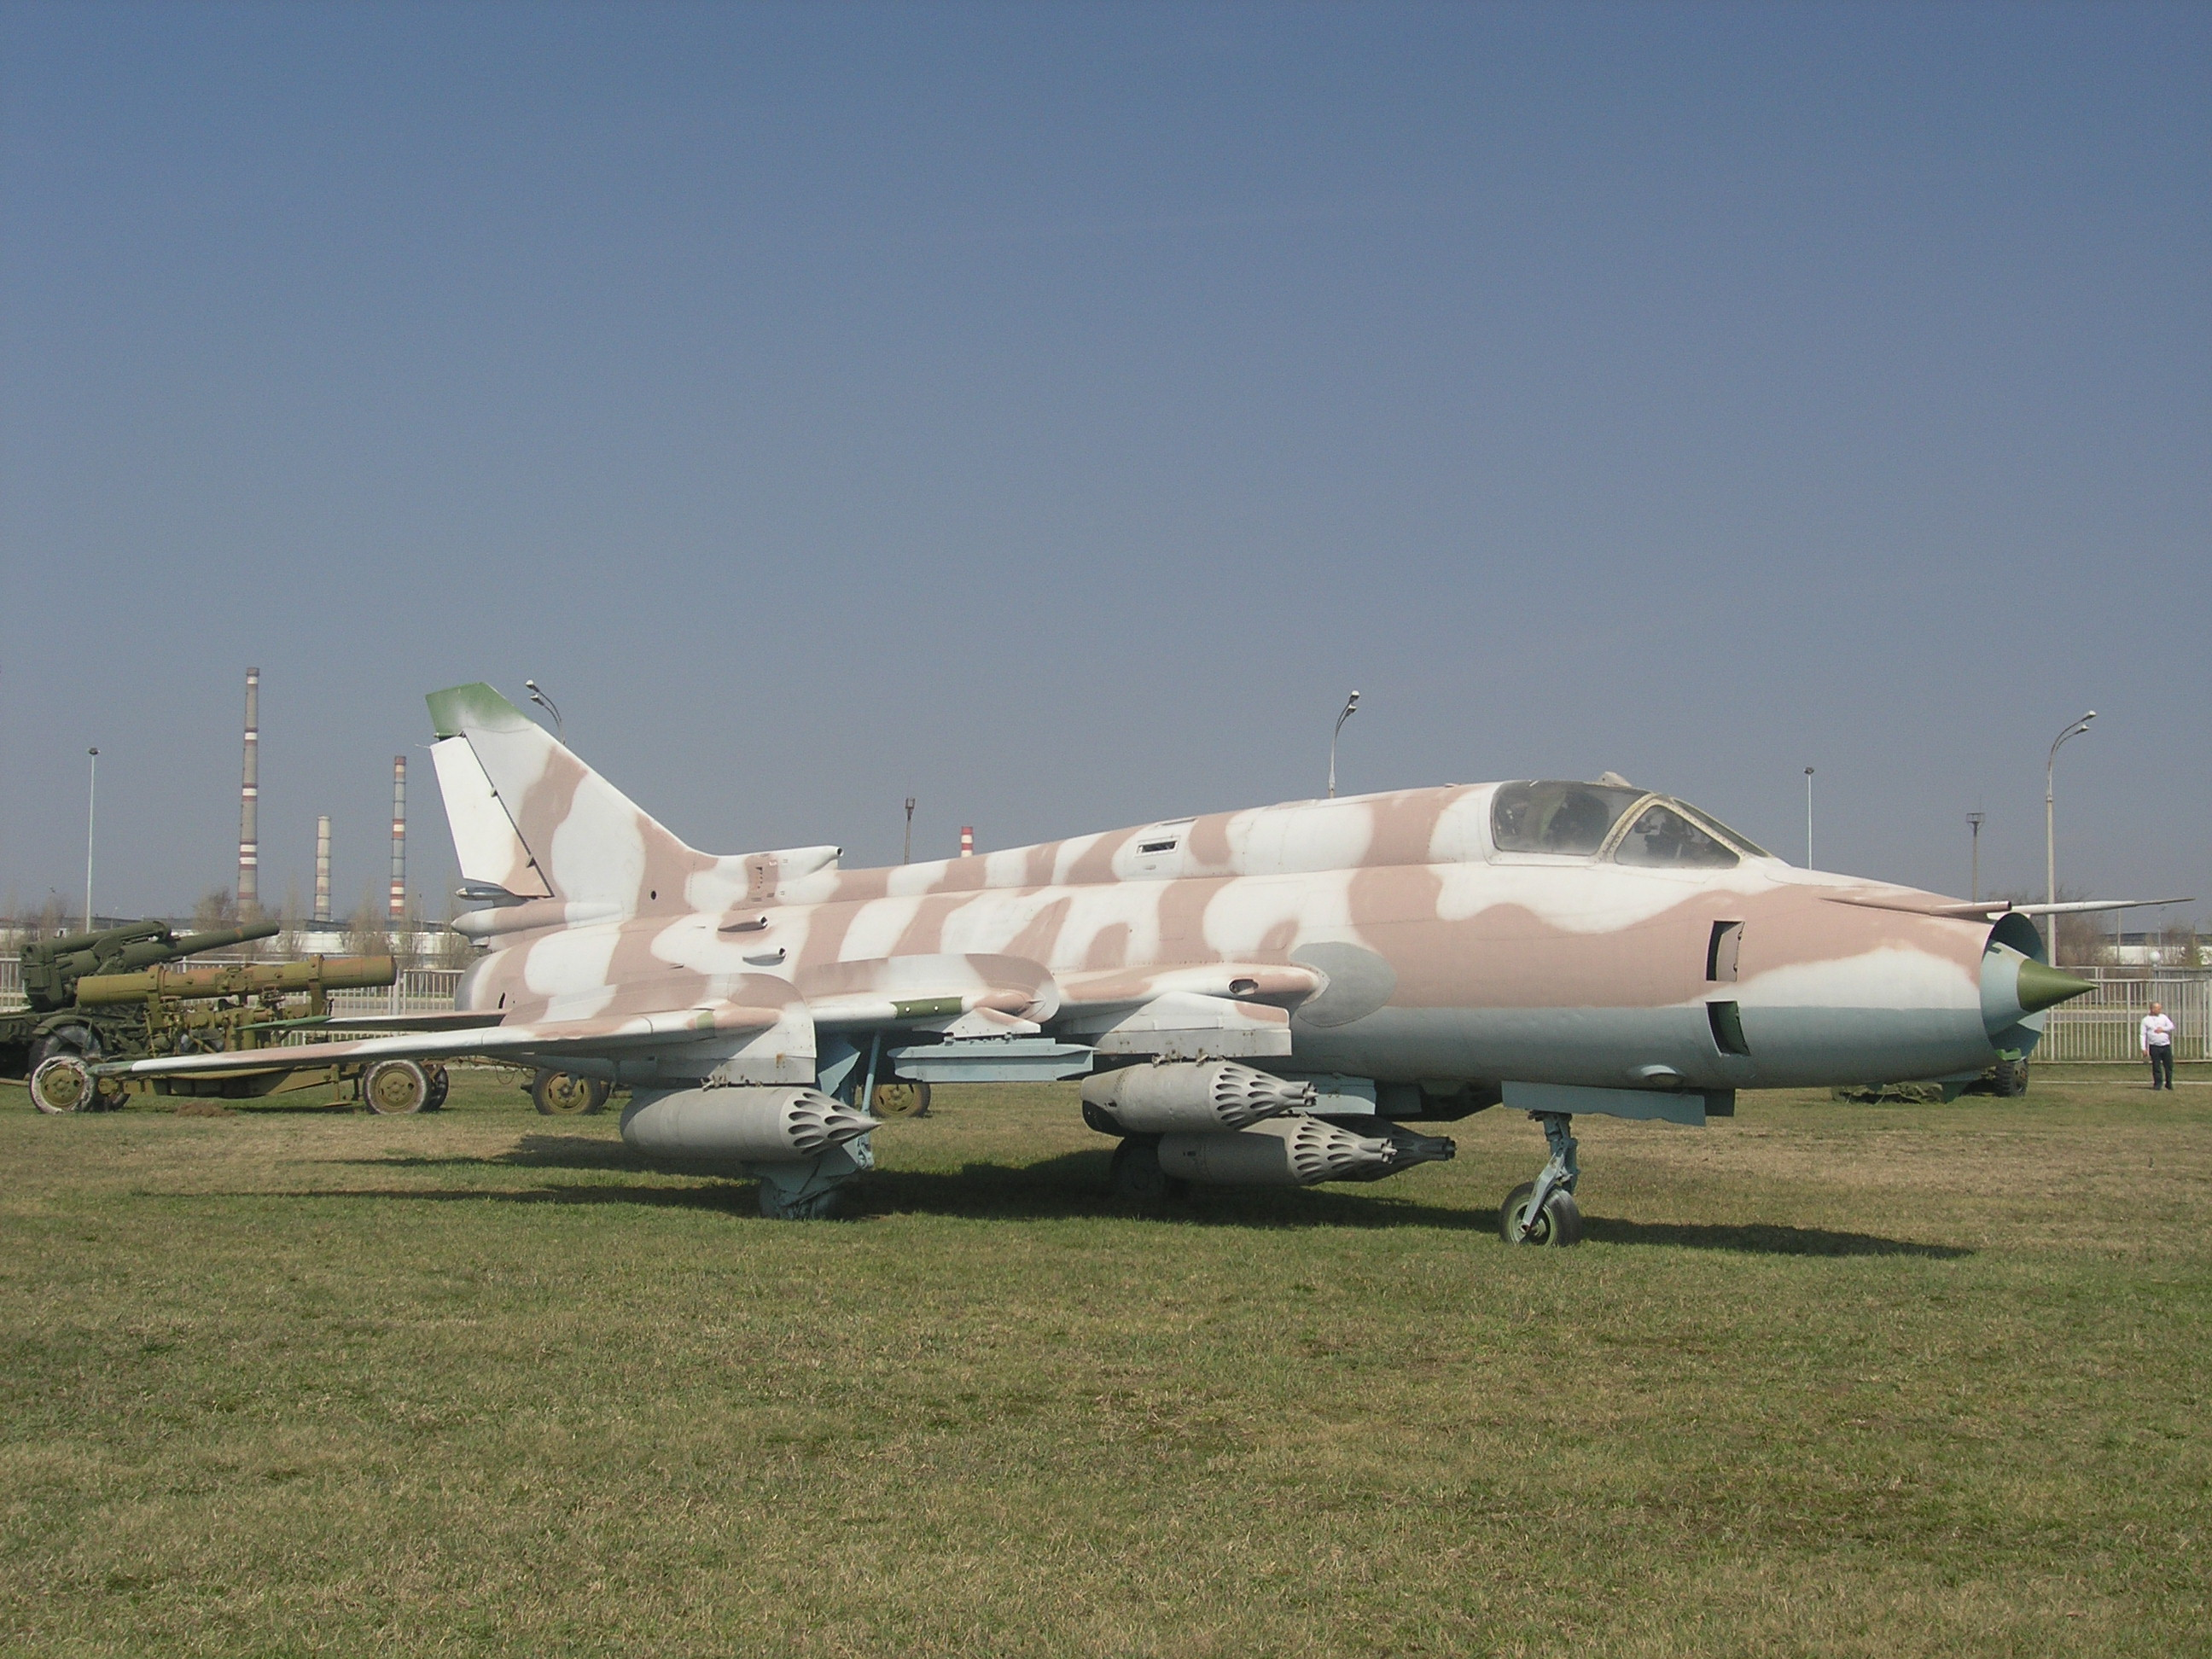 Sukhoi Su 17, Technical museum Togliatti Логопед: Чем Занимается, Какие Органы И Болезни Лечит